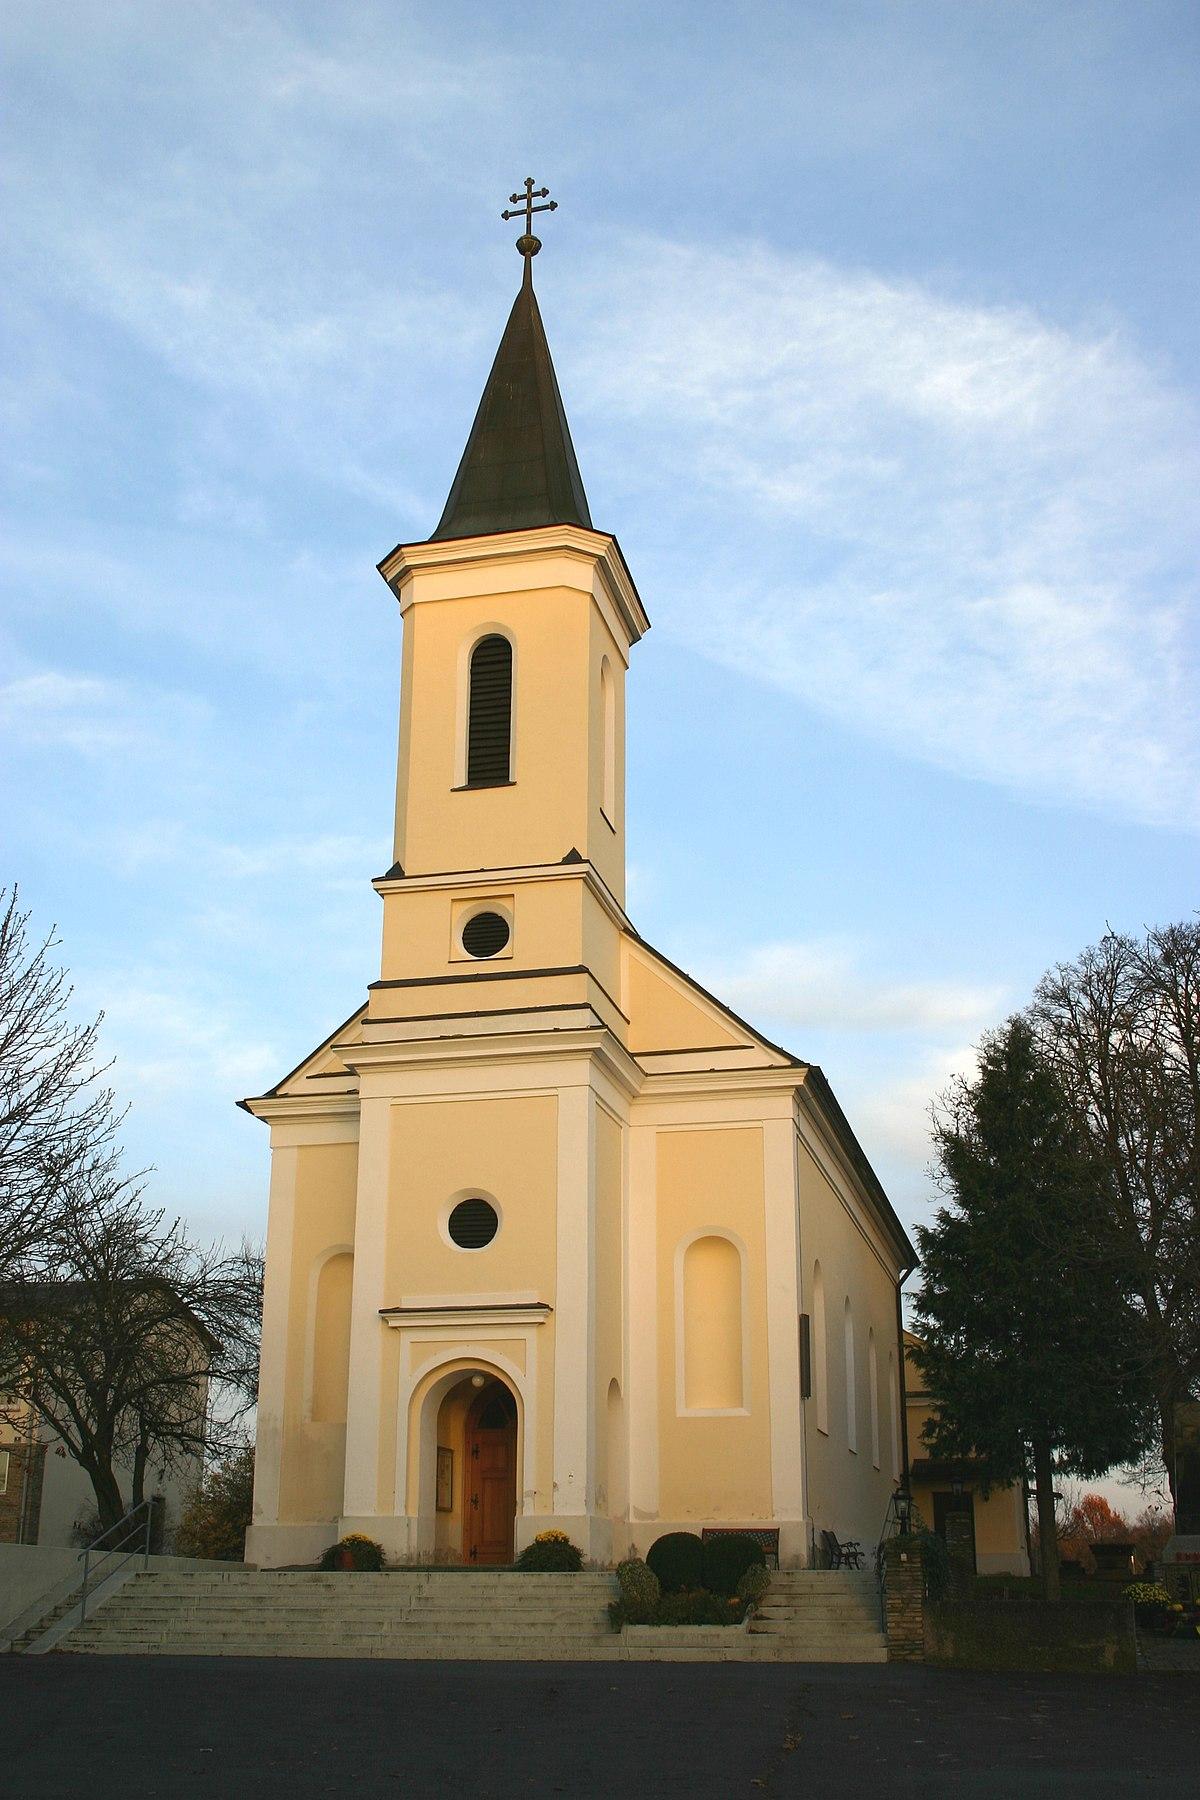 Katholische Kirche Glinde